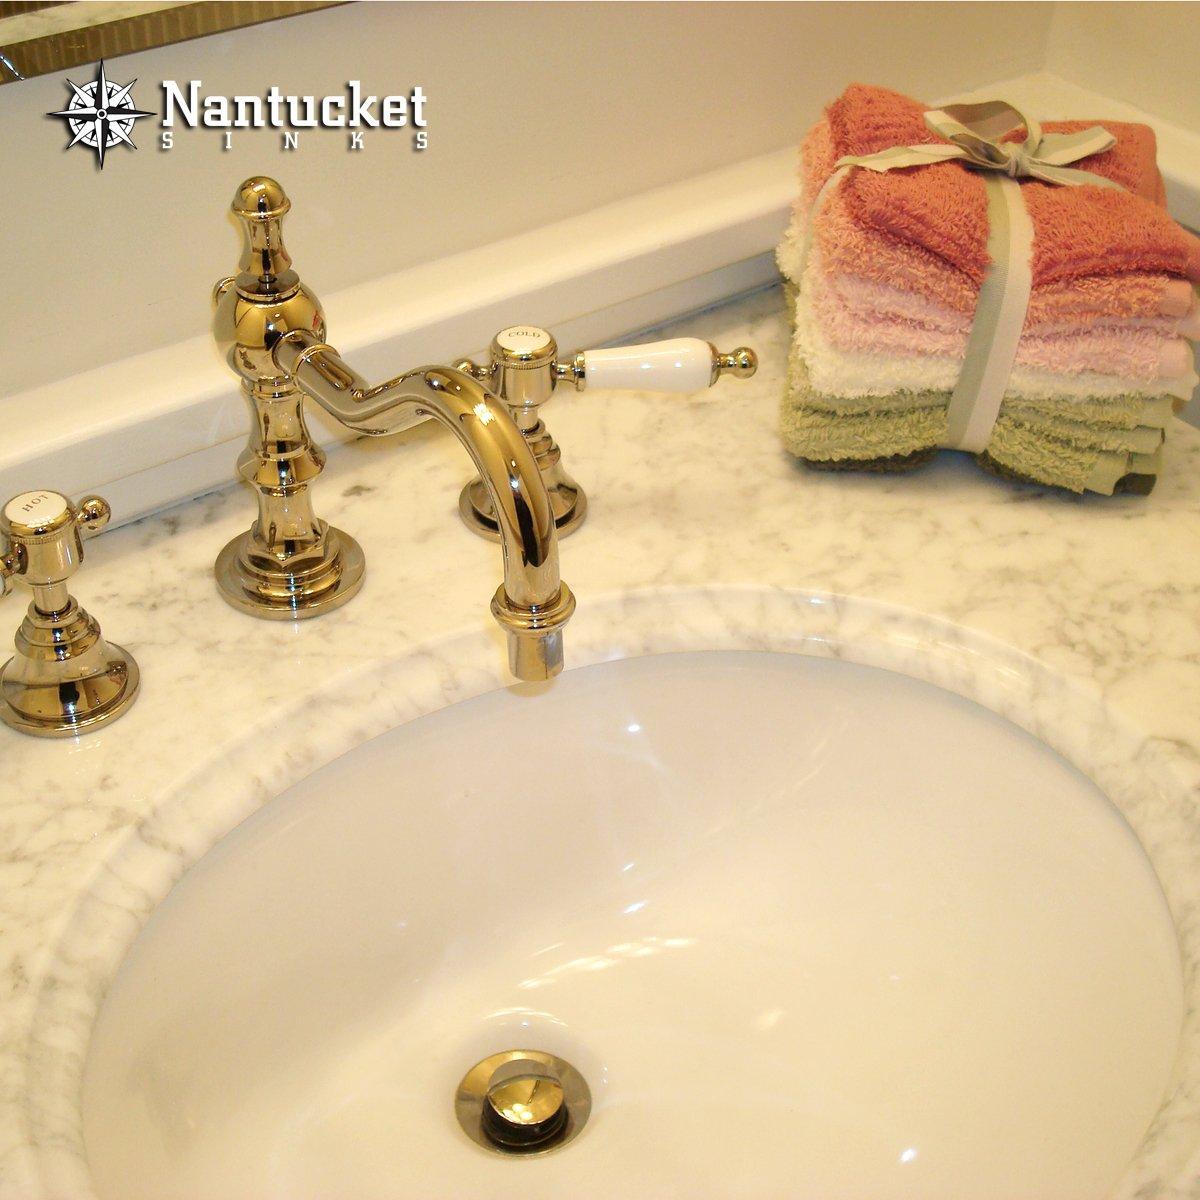 Nantucket Sinks UM-17x14-W-K 17-Inch by 14-Inch Oval Ceramic Undermount Vanity  Sink, White - Bathroom Vanities - Amazon.com